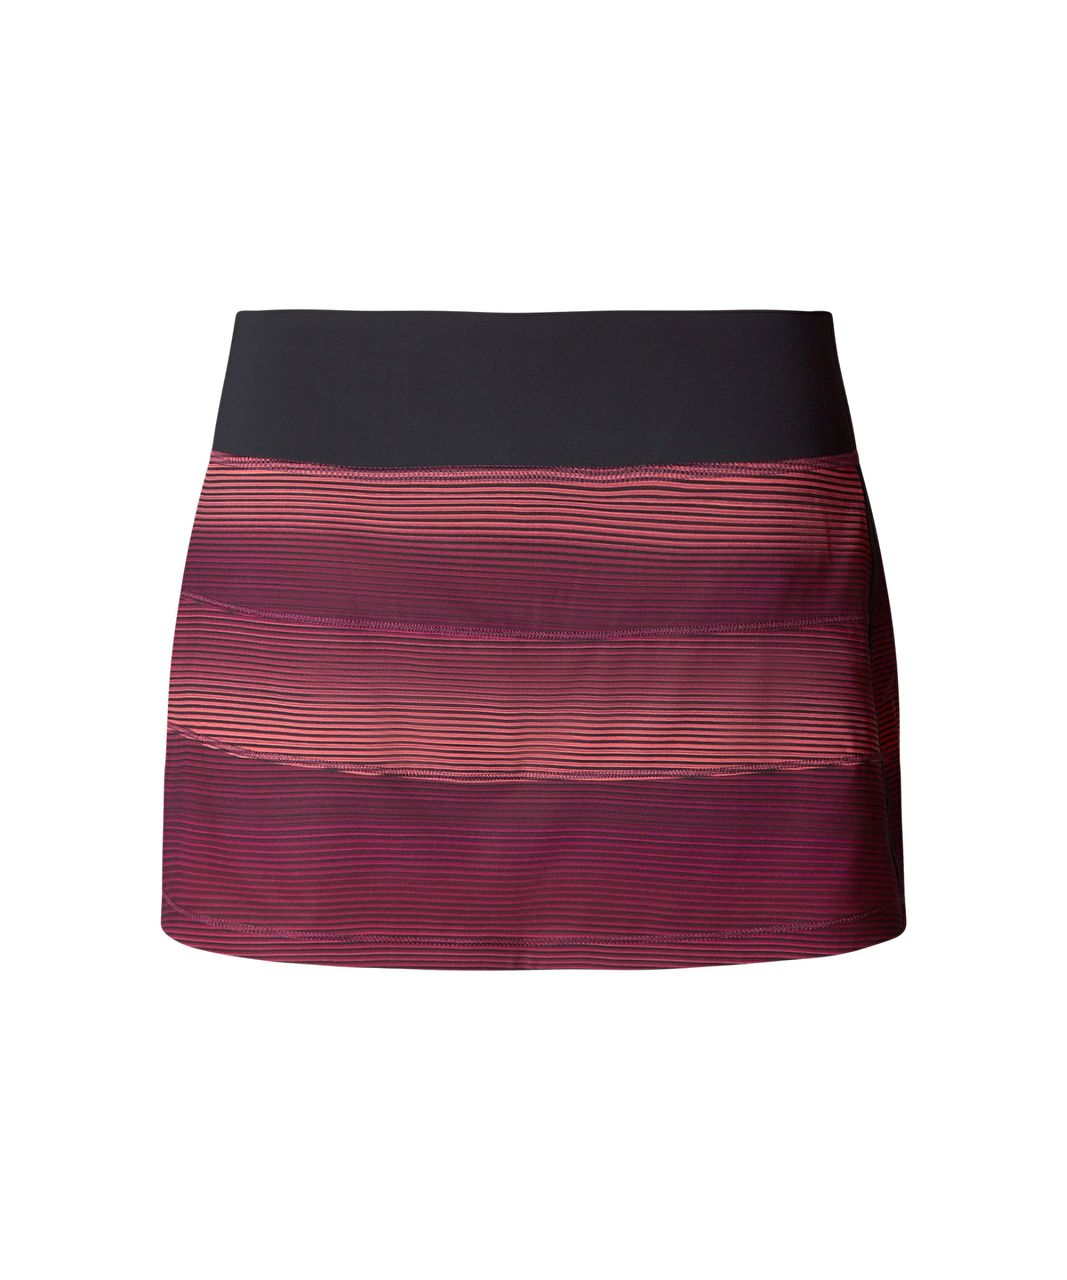 Lululemon Pace Rival Skirt II (Regular) - Simply Radiant Pink Paradise Black / Black